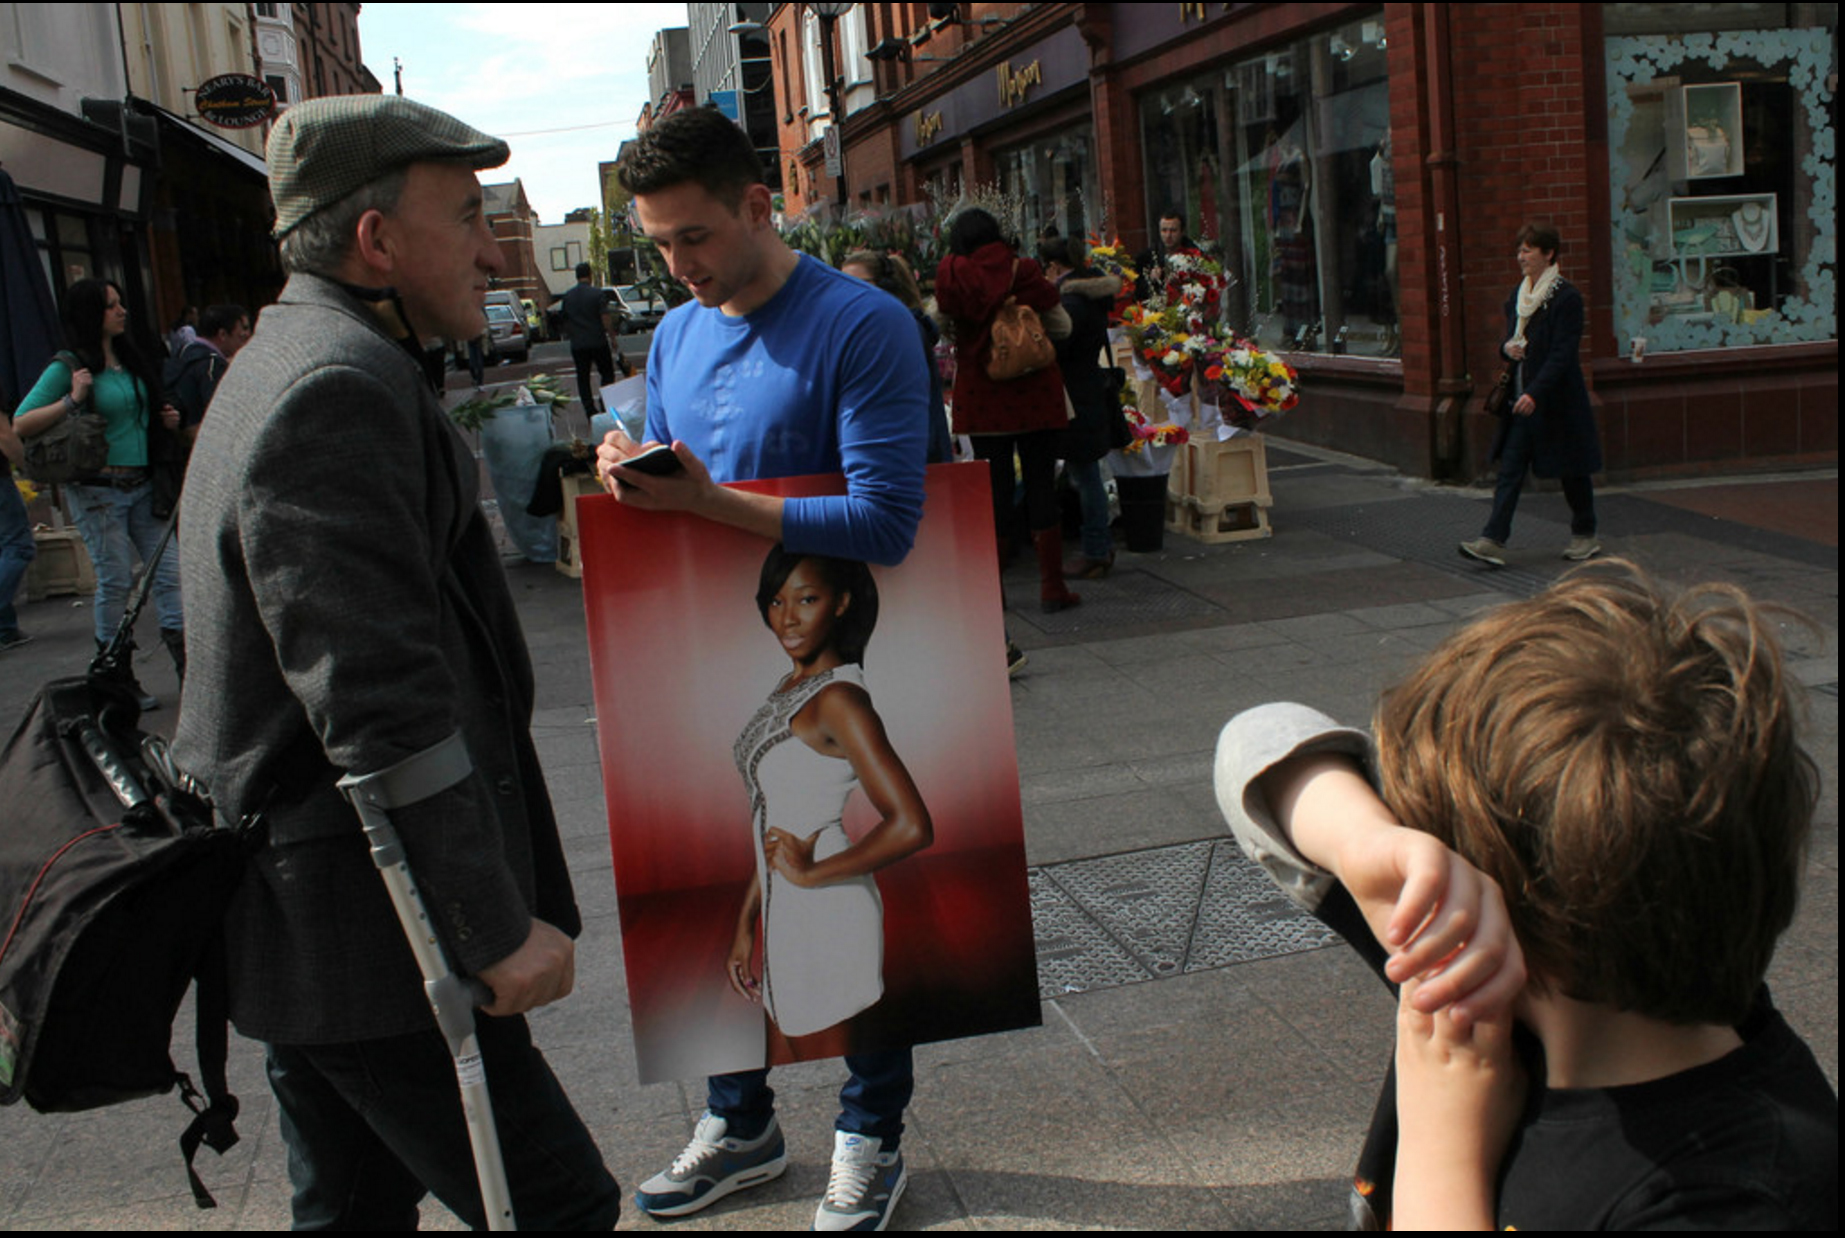 Dublin, 2014 (Danielle Houghton/GroundTruth)